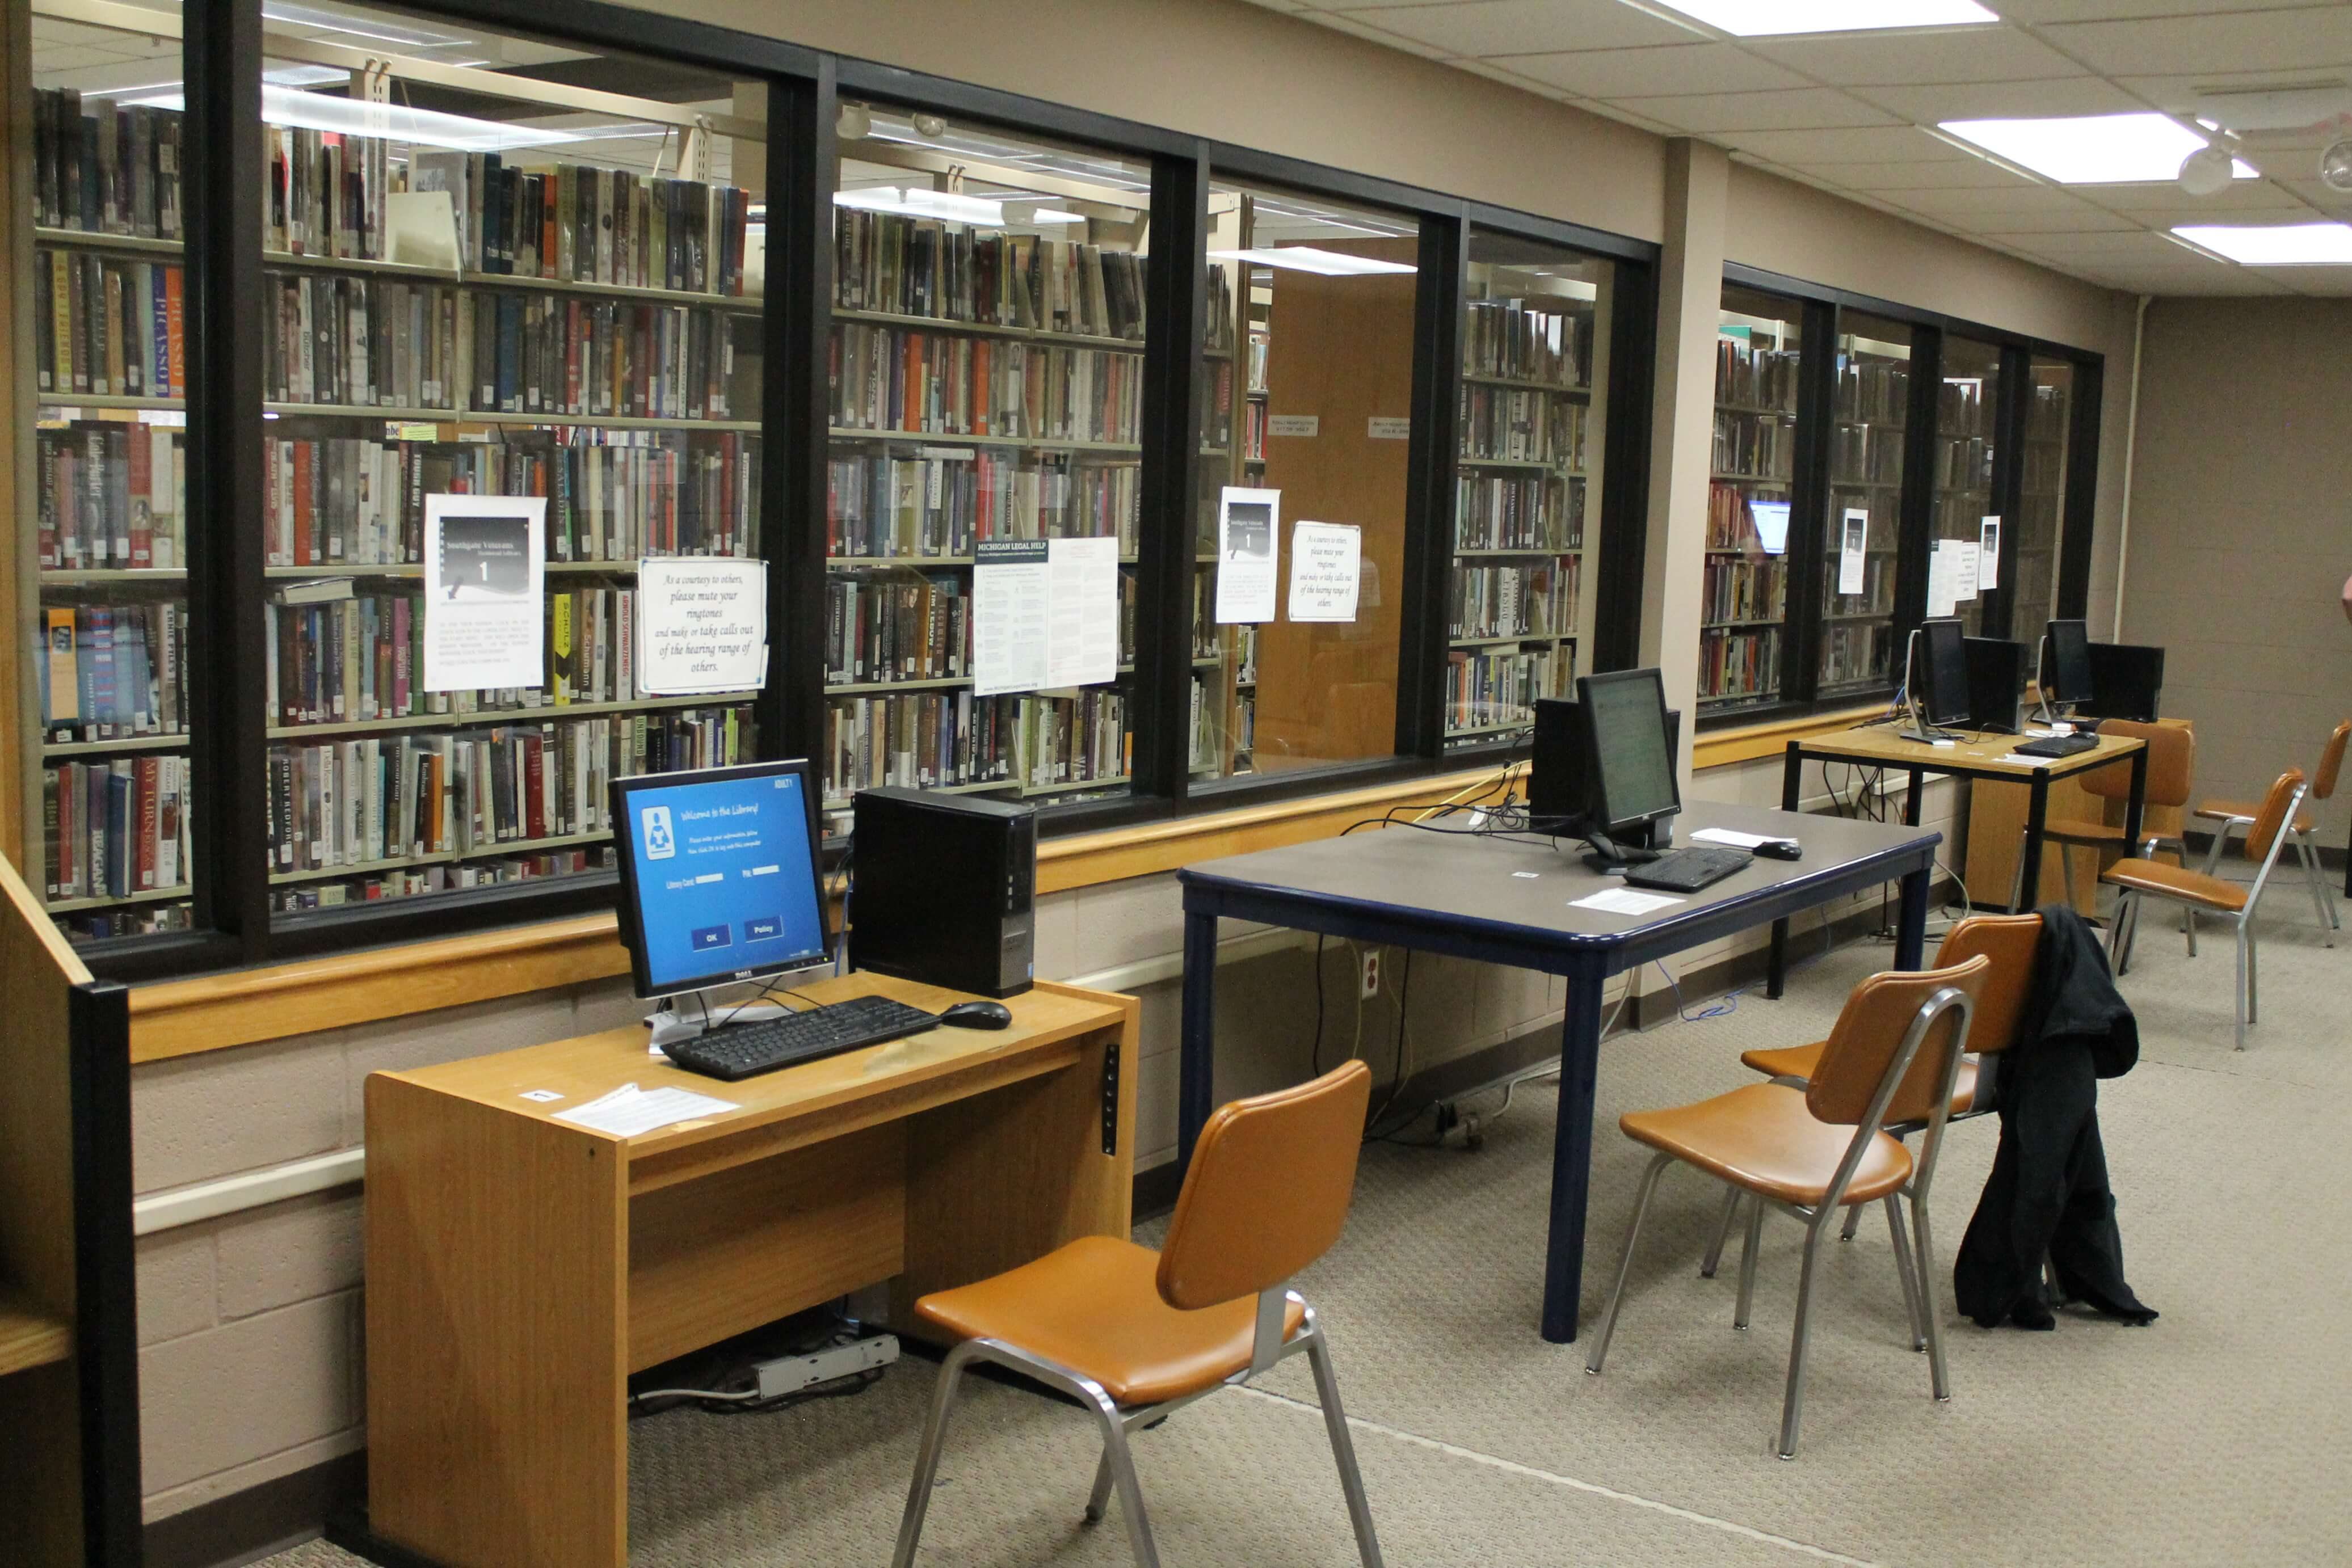 Southgate Veterans Memorial Library Policies